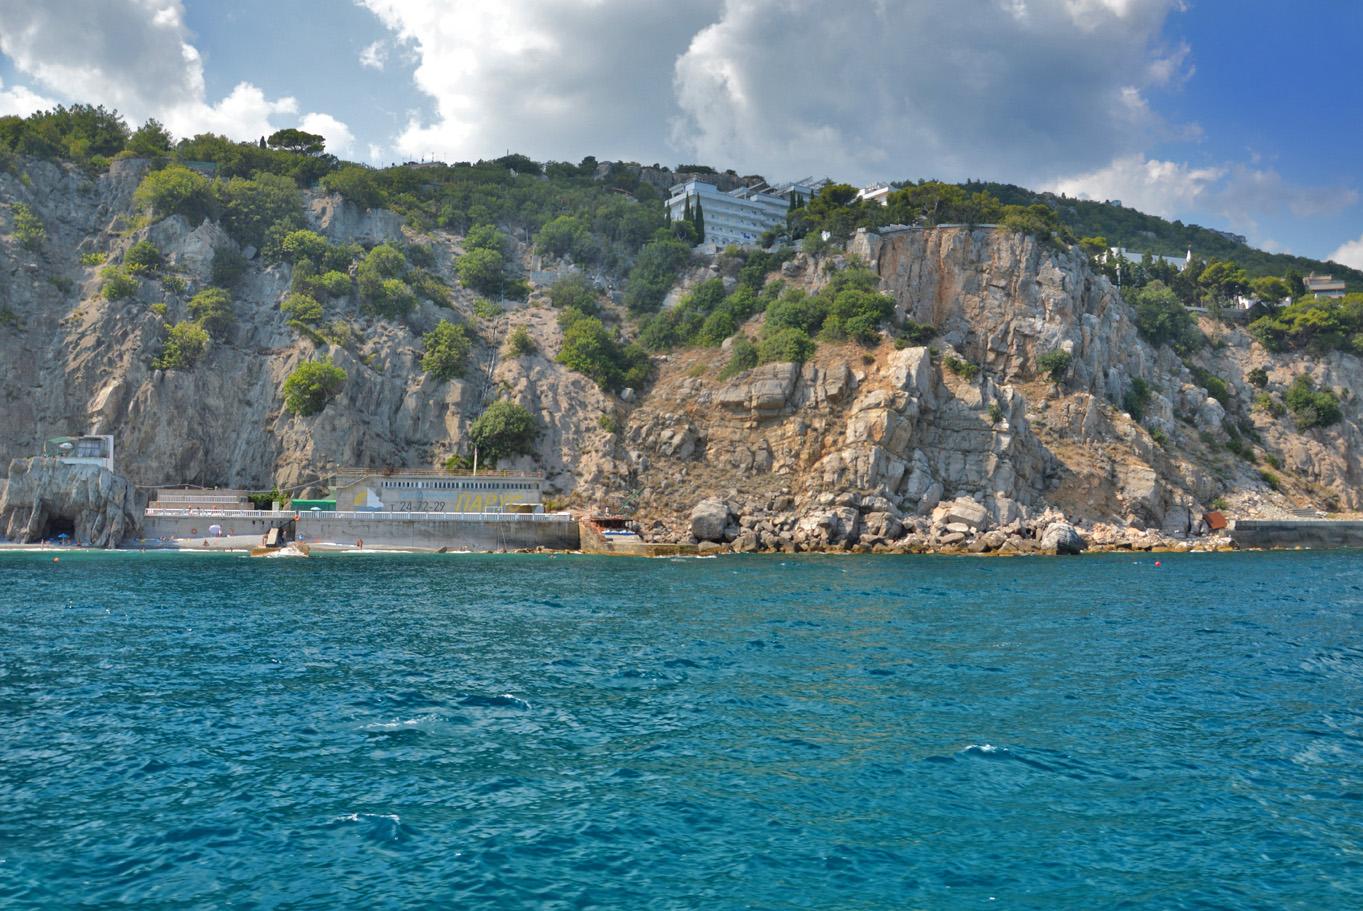 Cliffs at Swallow's Nest